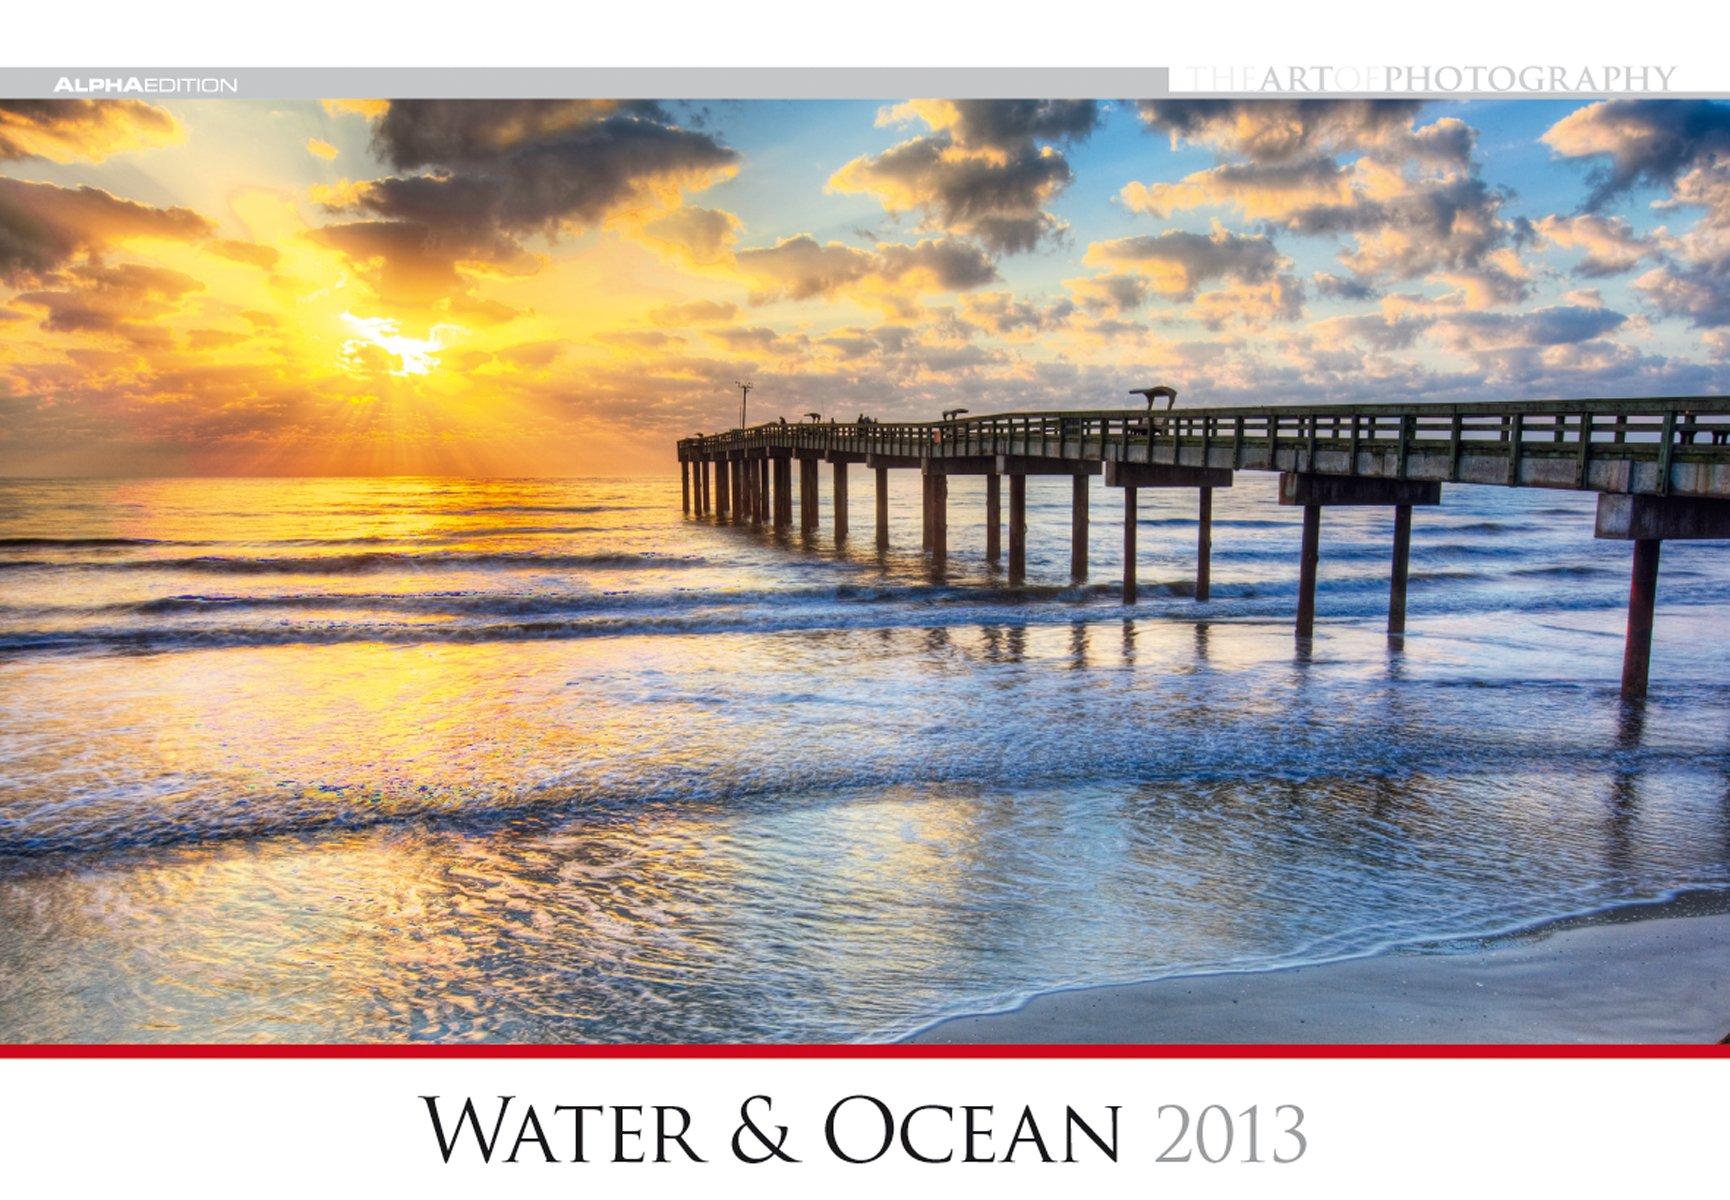 The Art of Photography: Water & Ocean, Bildkalender 2013